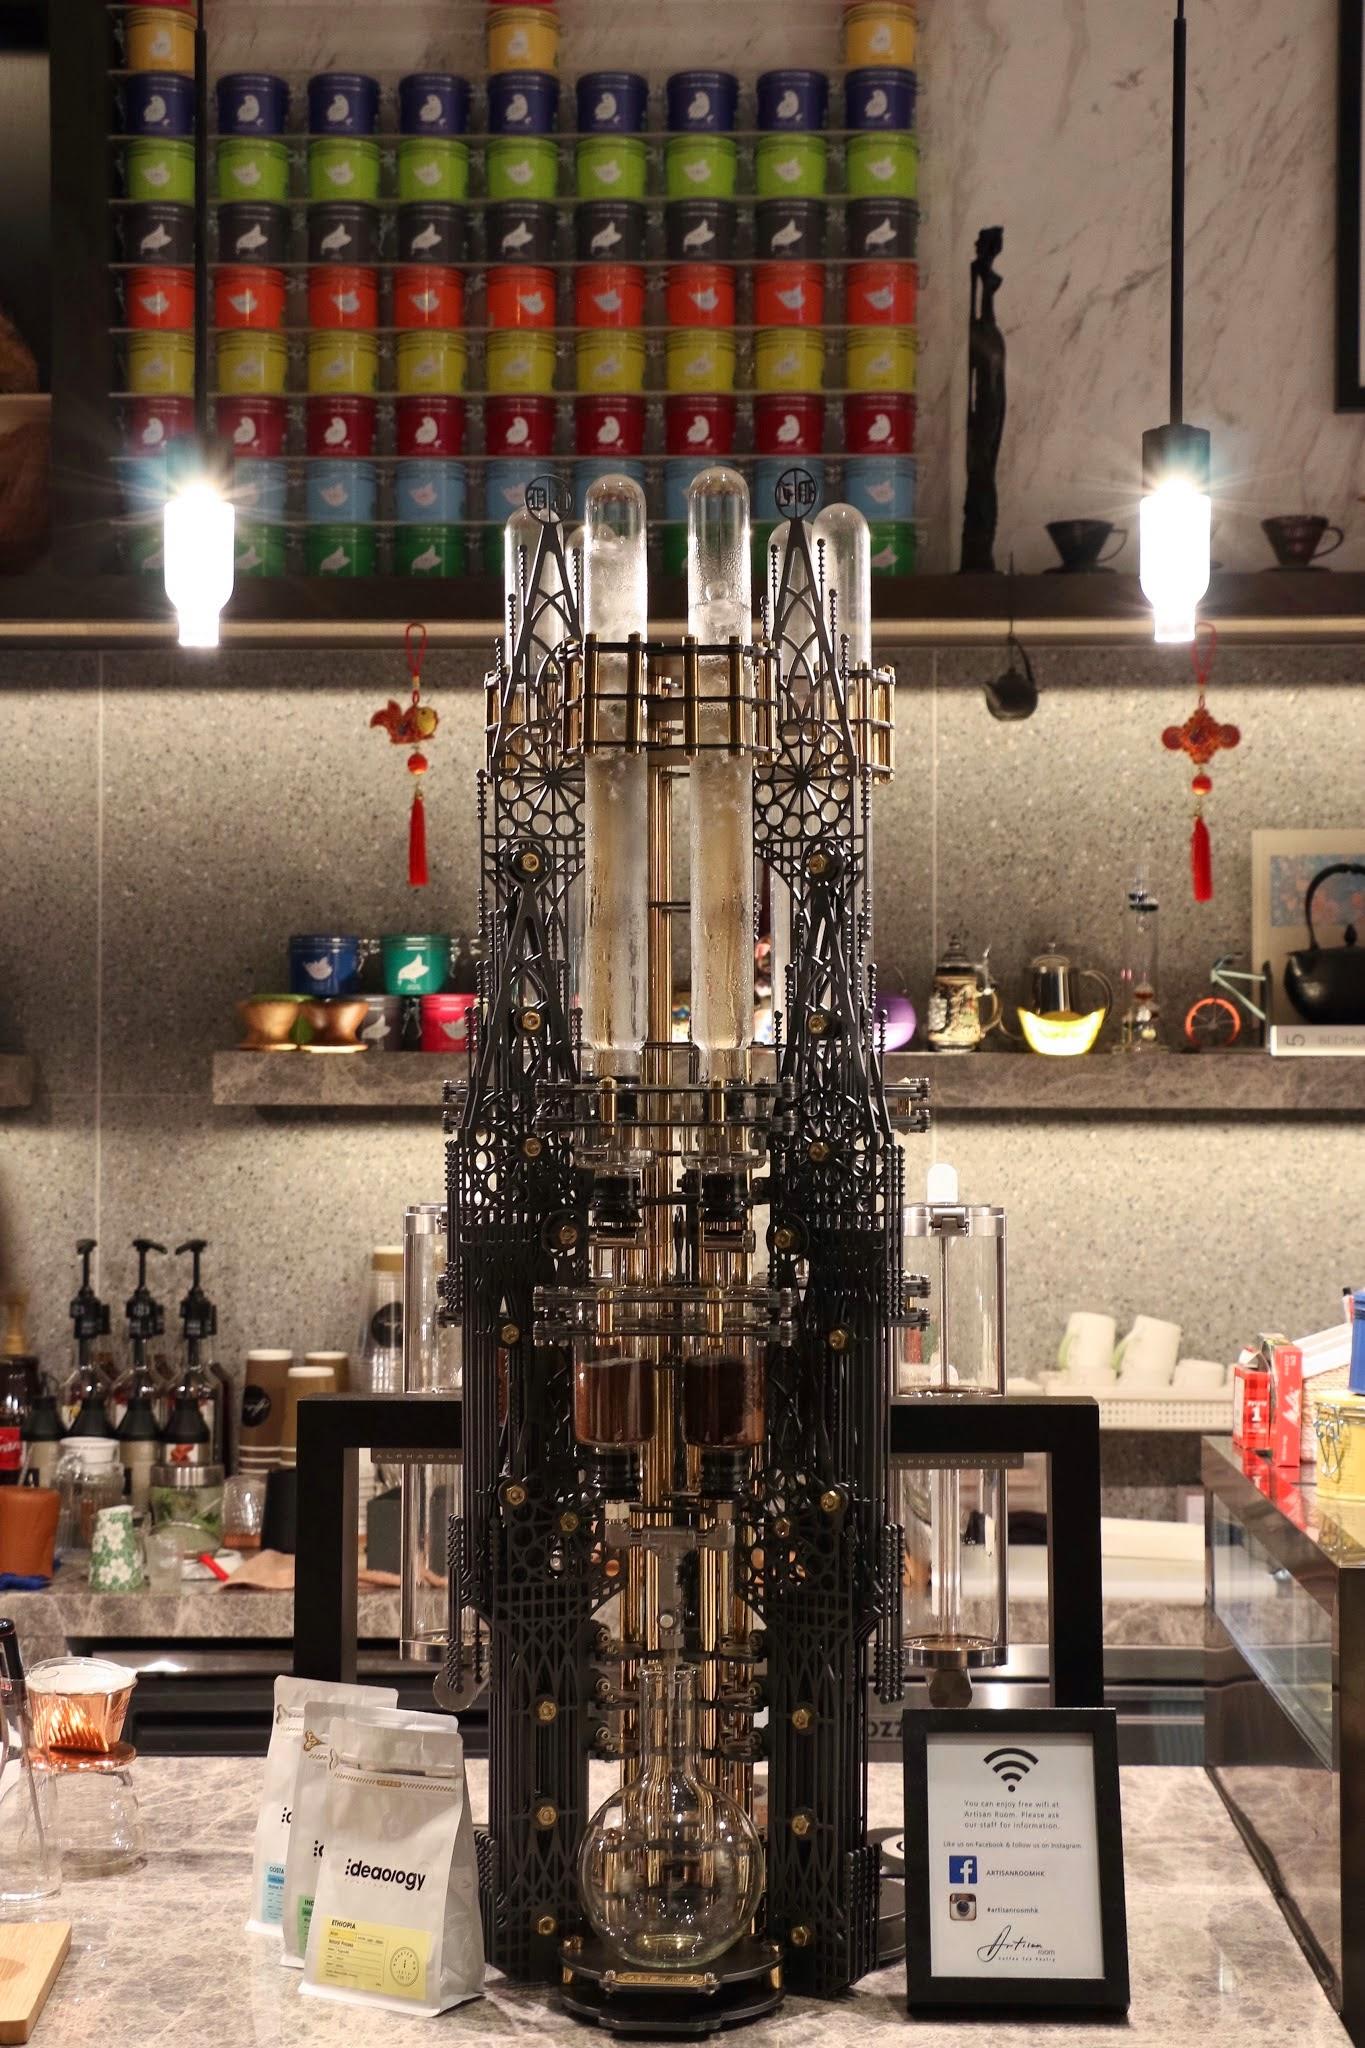 Artisan Room HK, Gothicim